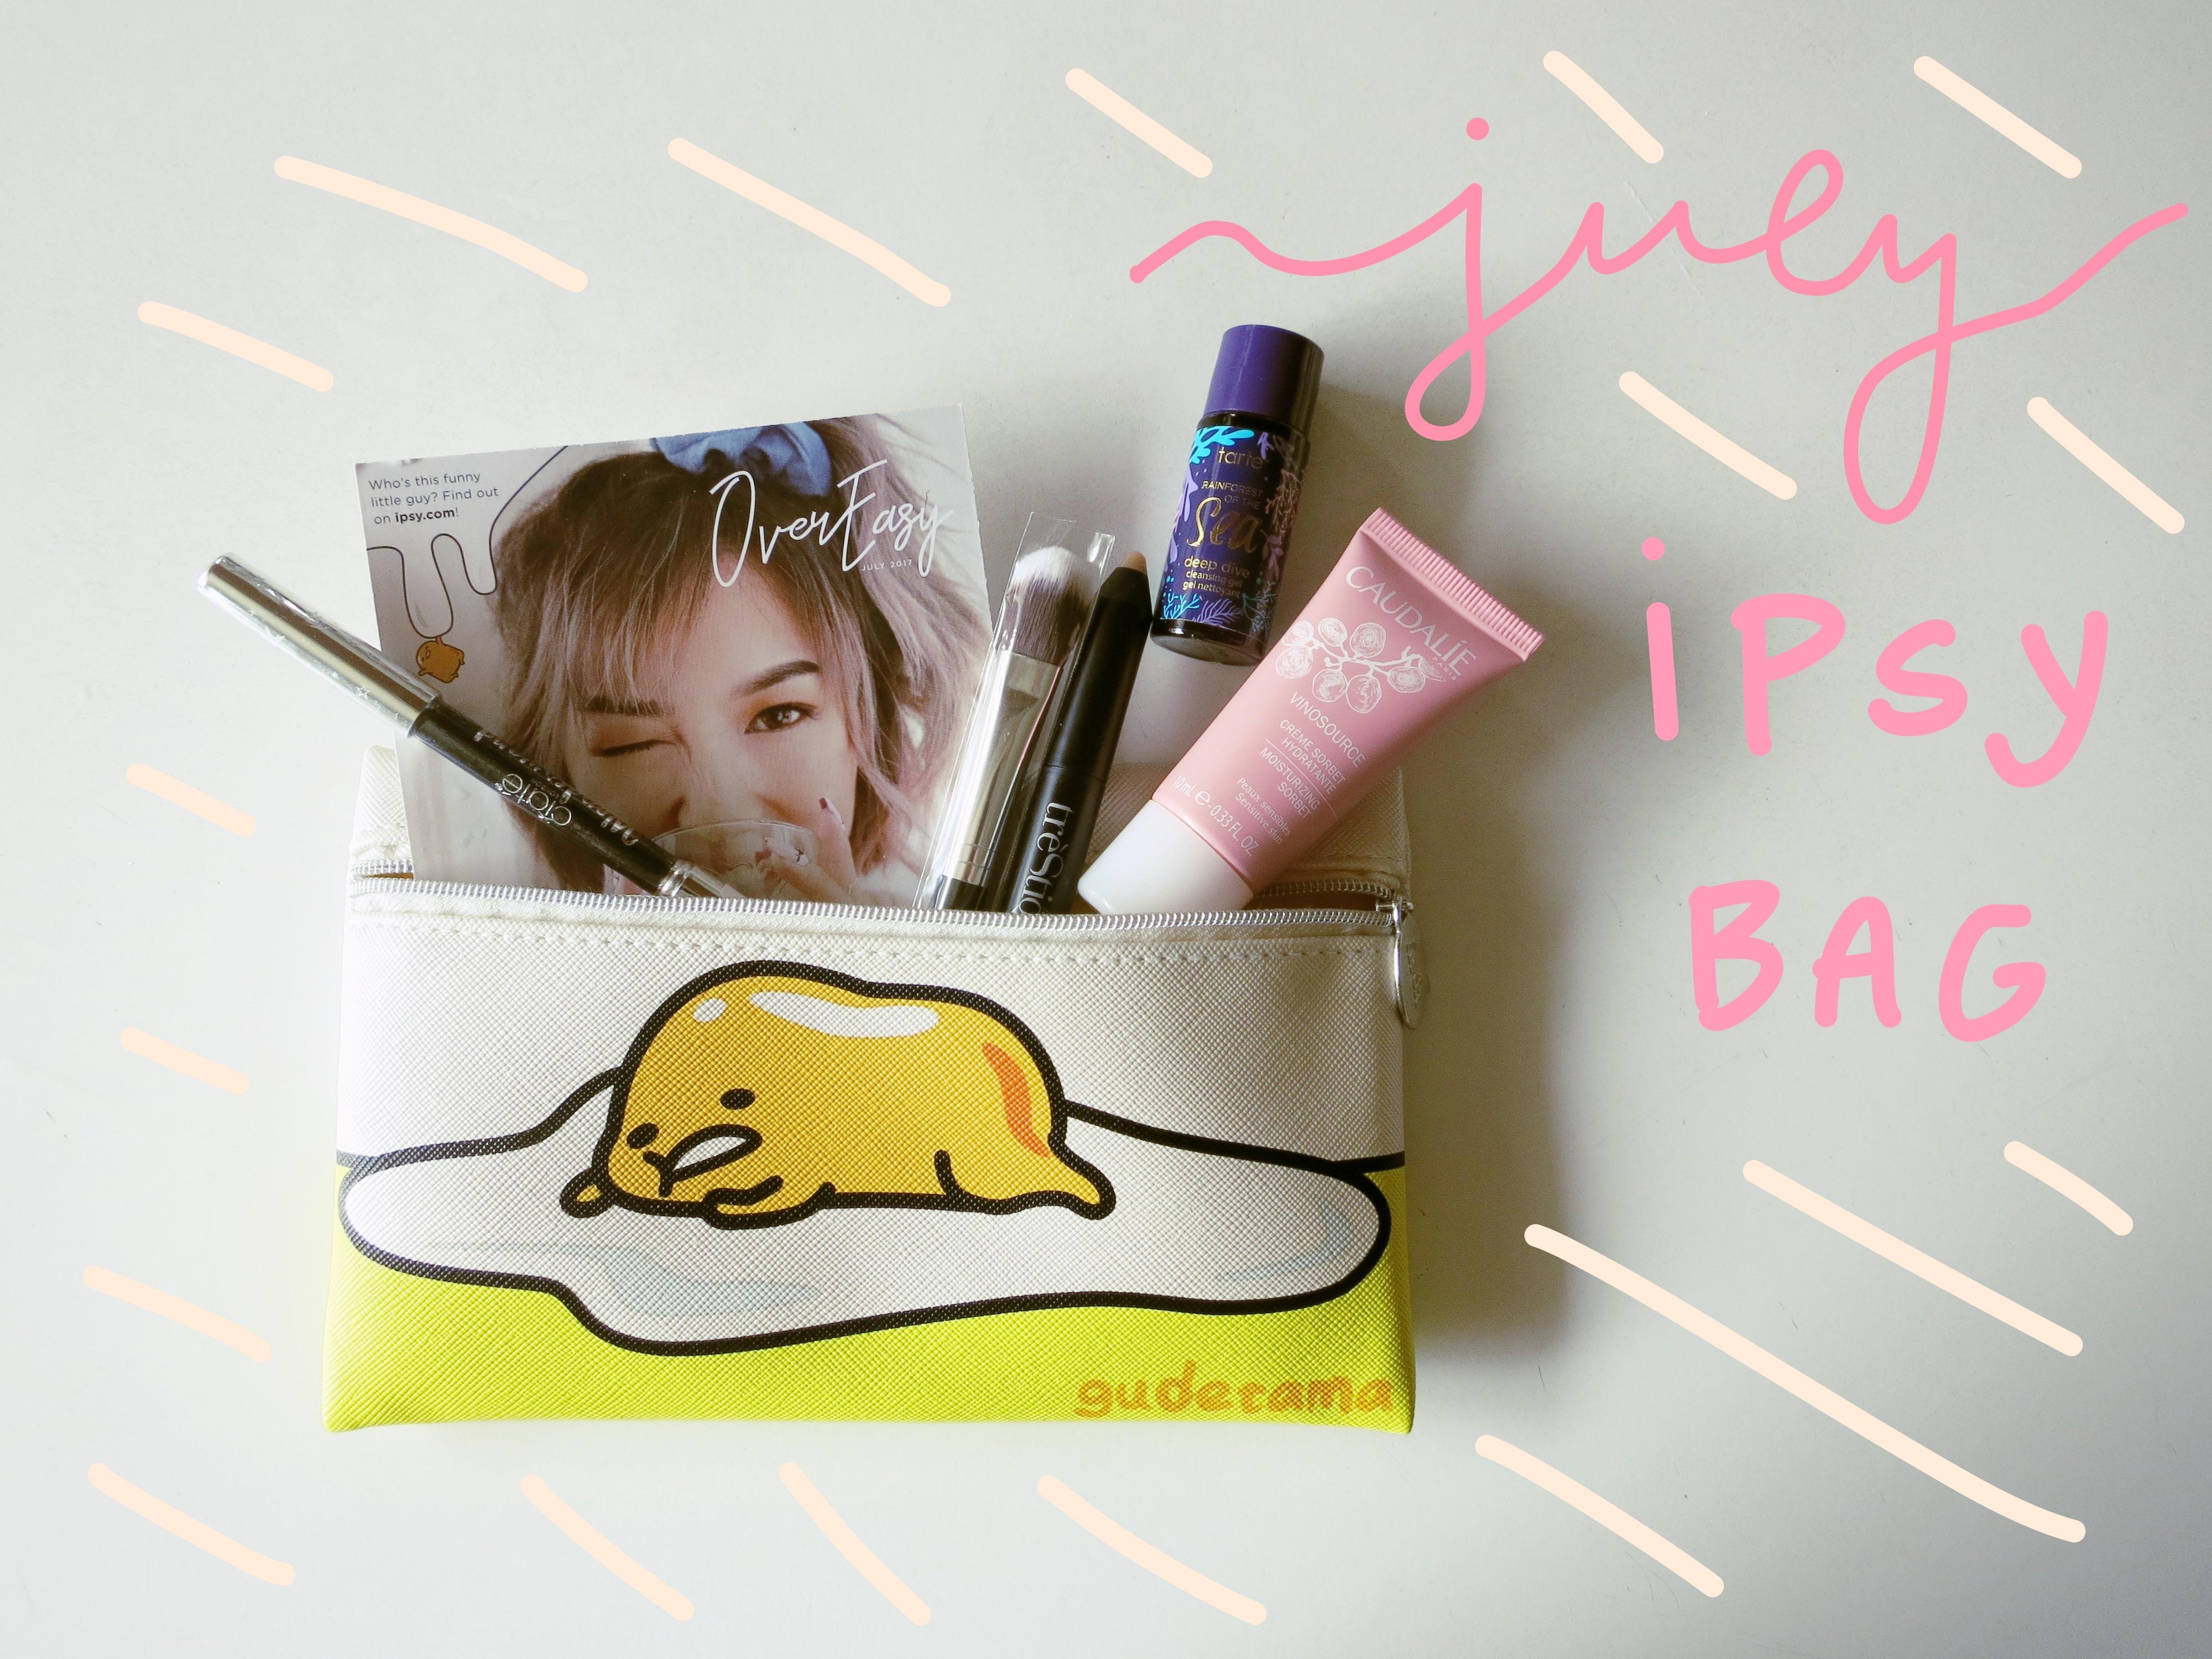 july '17 Ipsy bag